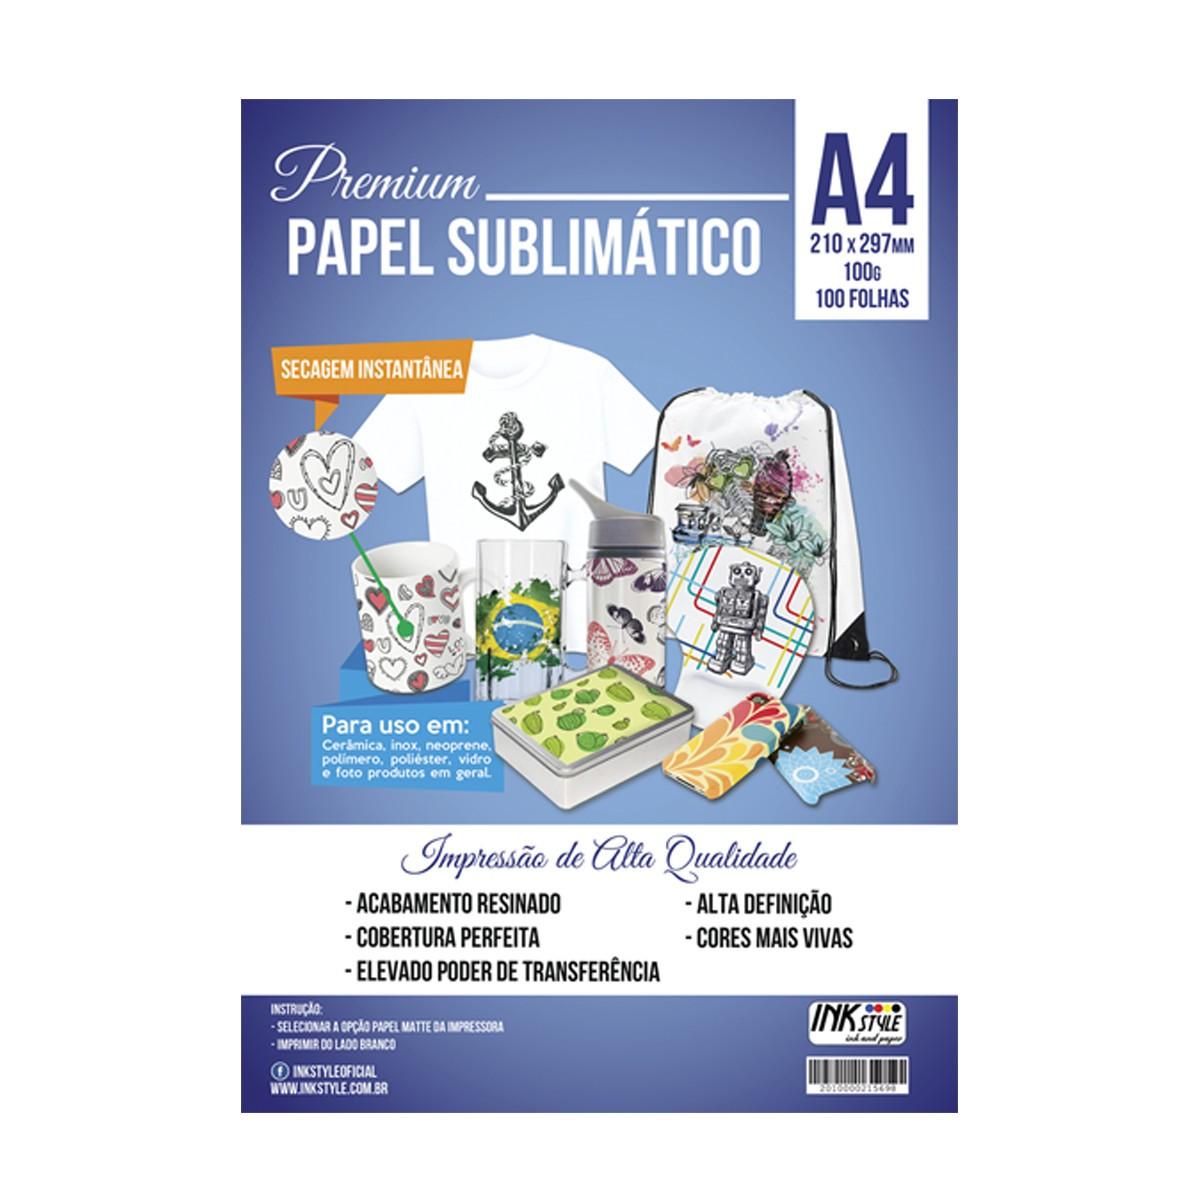 Kit Tinta Sublimatica + 1 Papel Sublimatico